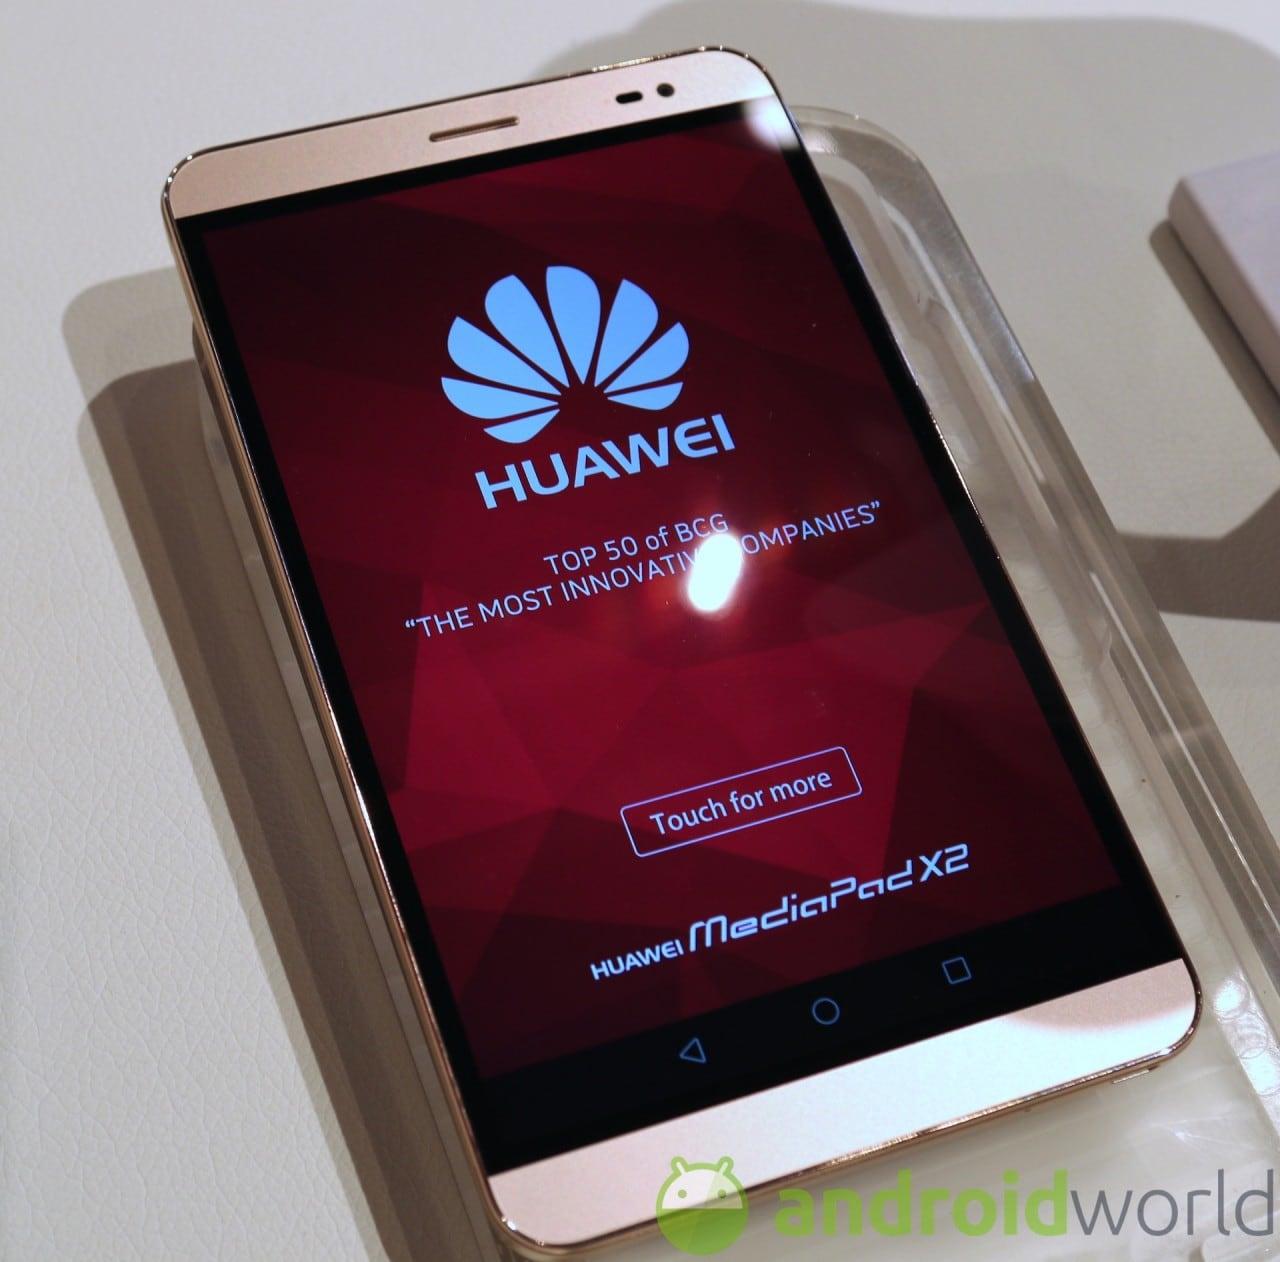 Huawei MediaPad X2 hands-on - 1